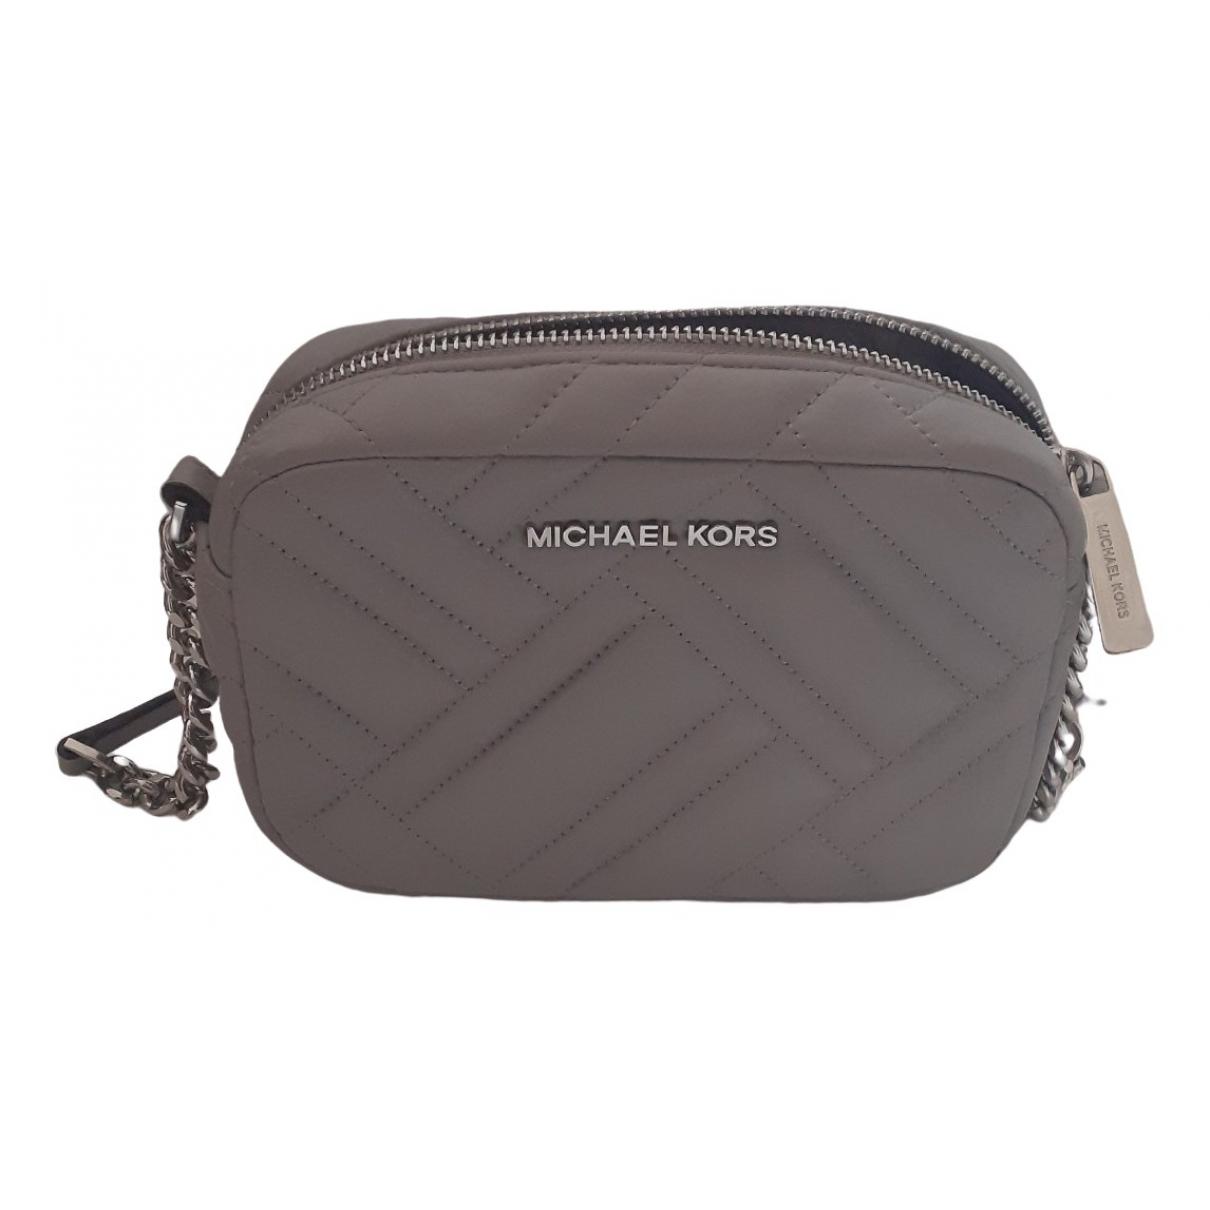 Michael Kors Sloan Handtasche in  Grau Leder